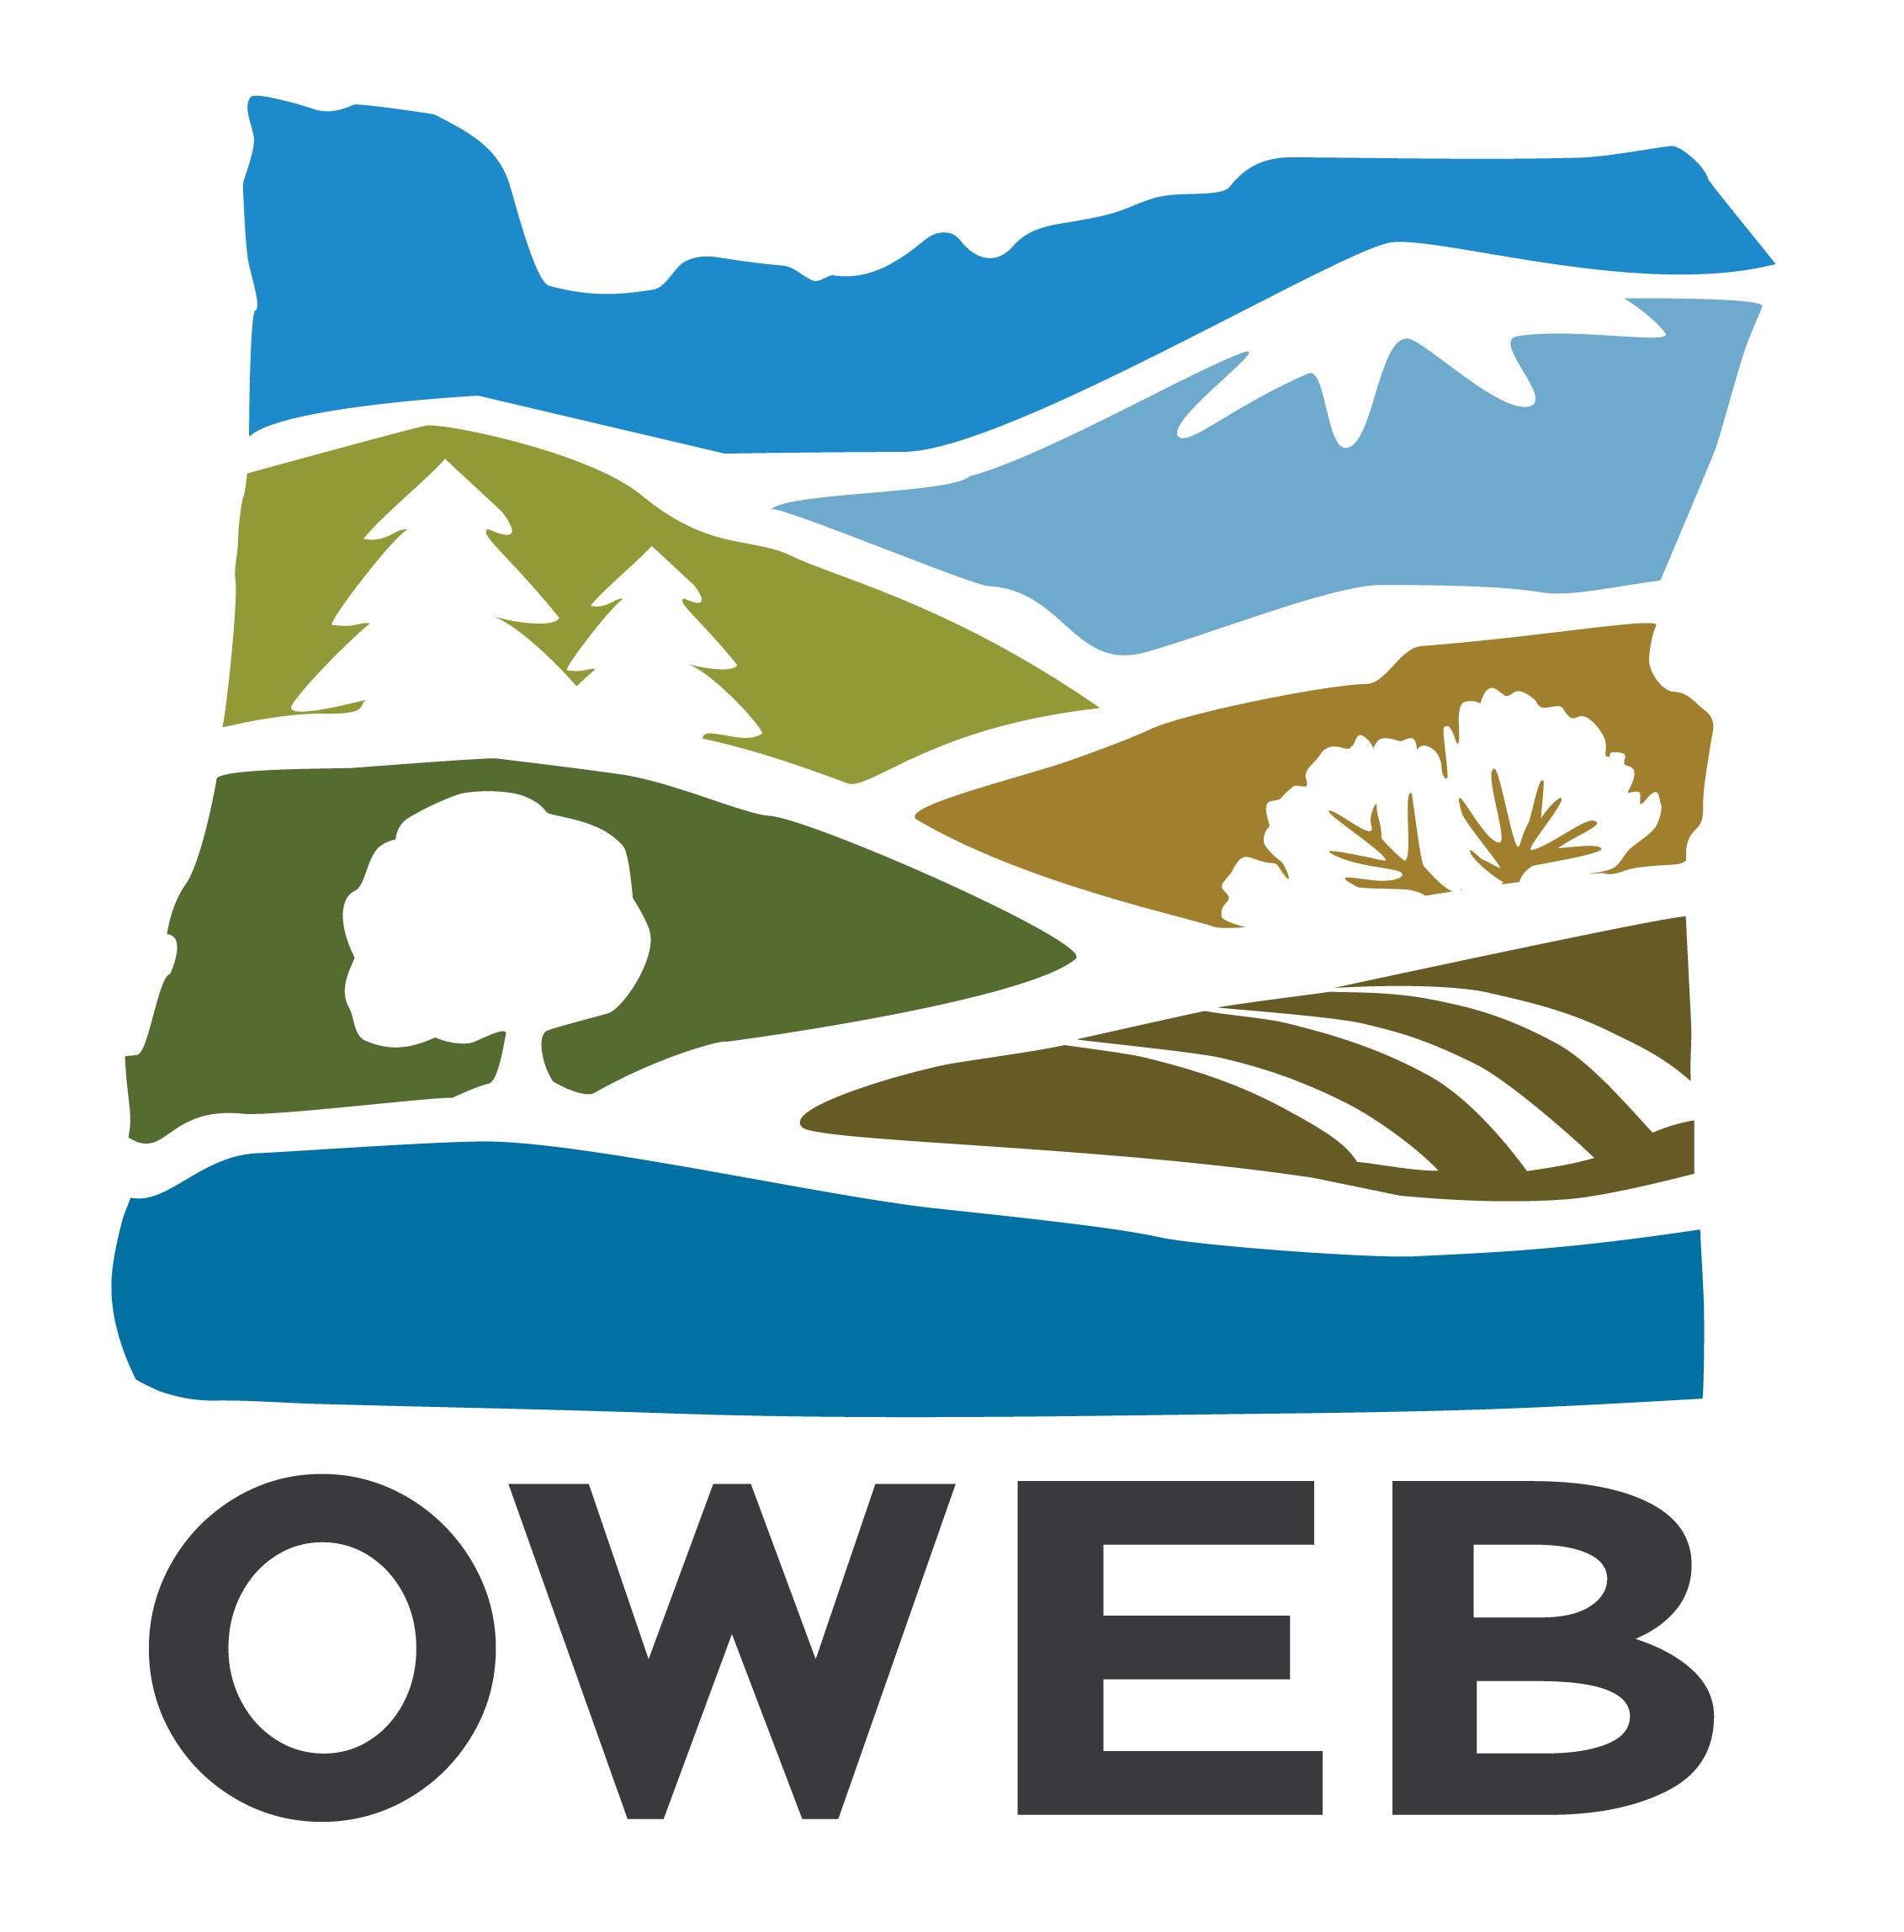 OWEB monogram logo